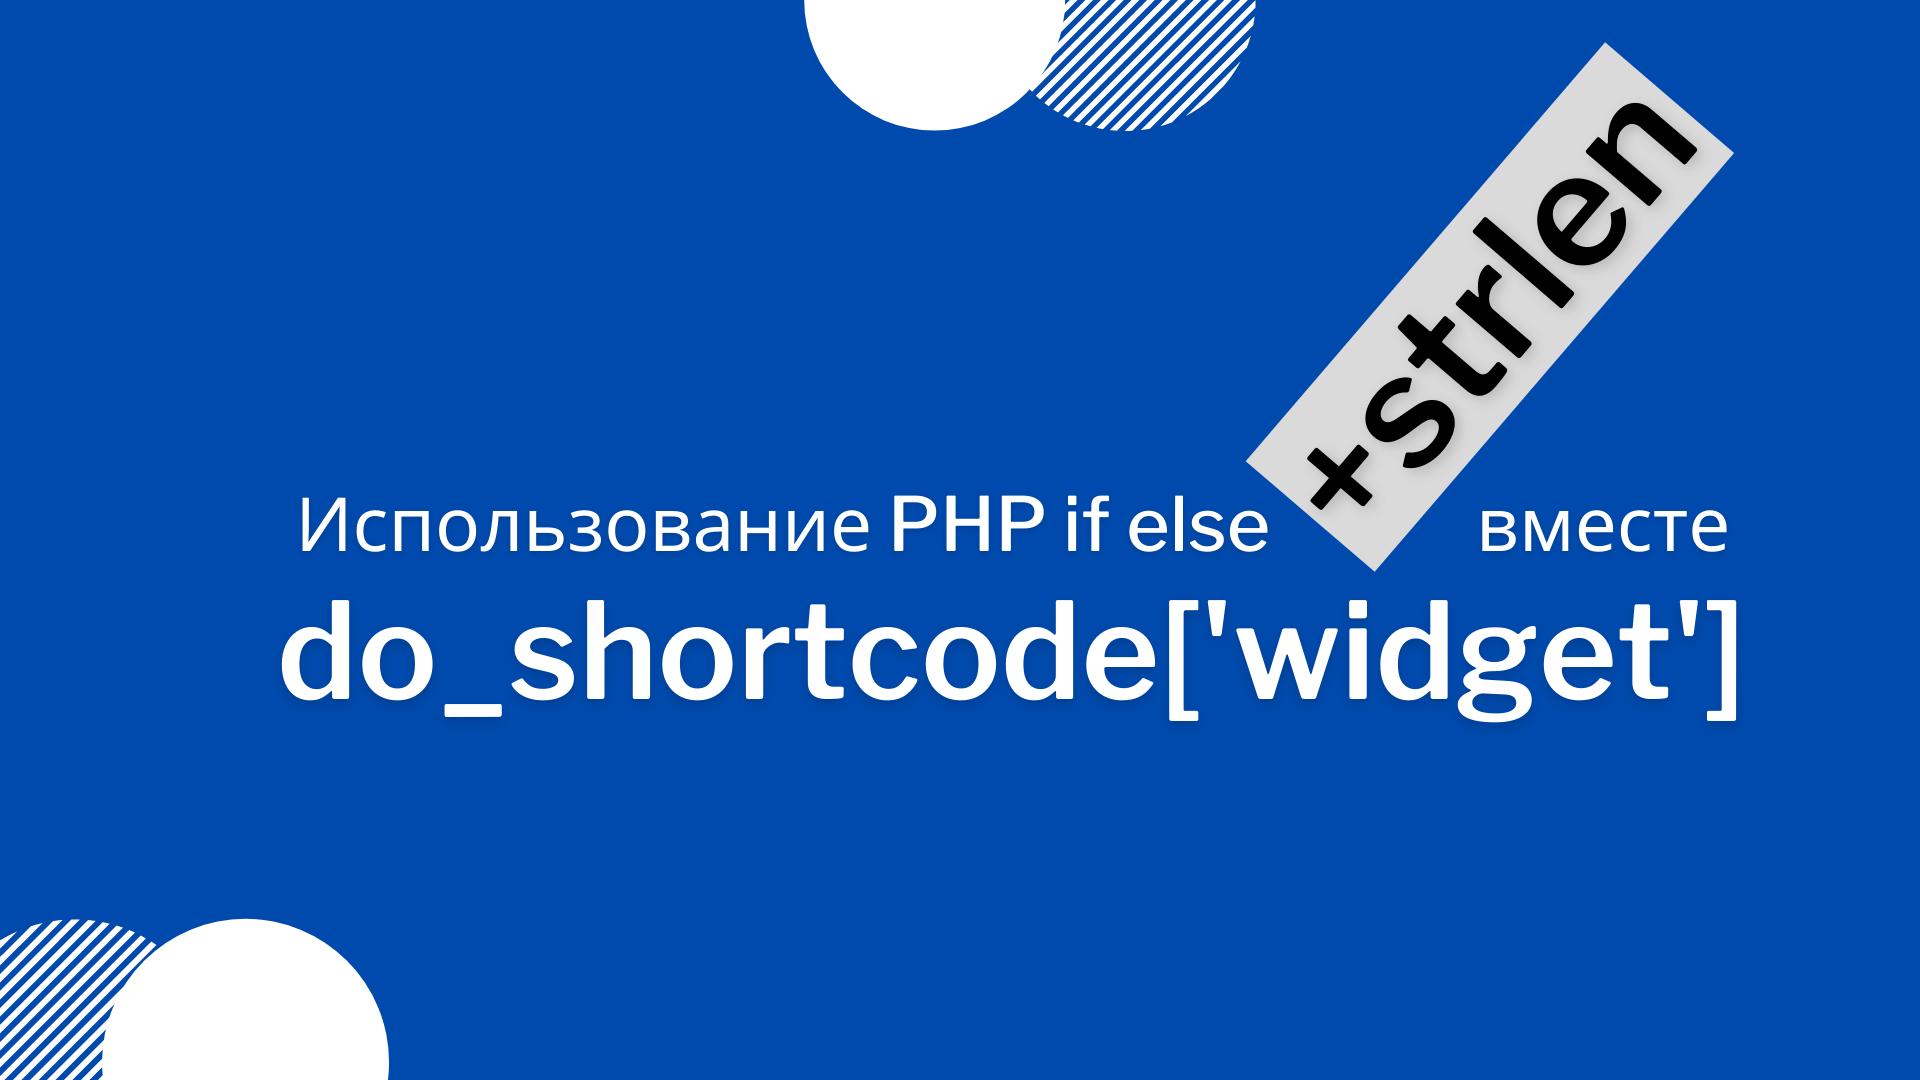 WordPress do_shortcode и PHP if else условие